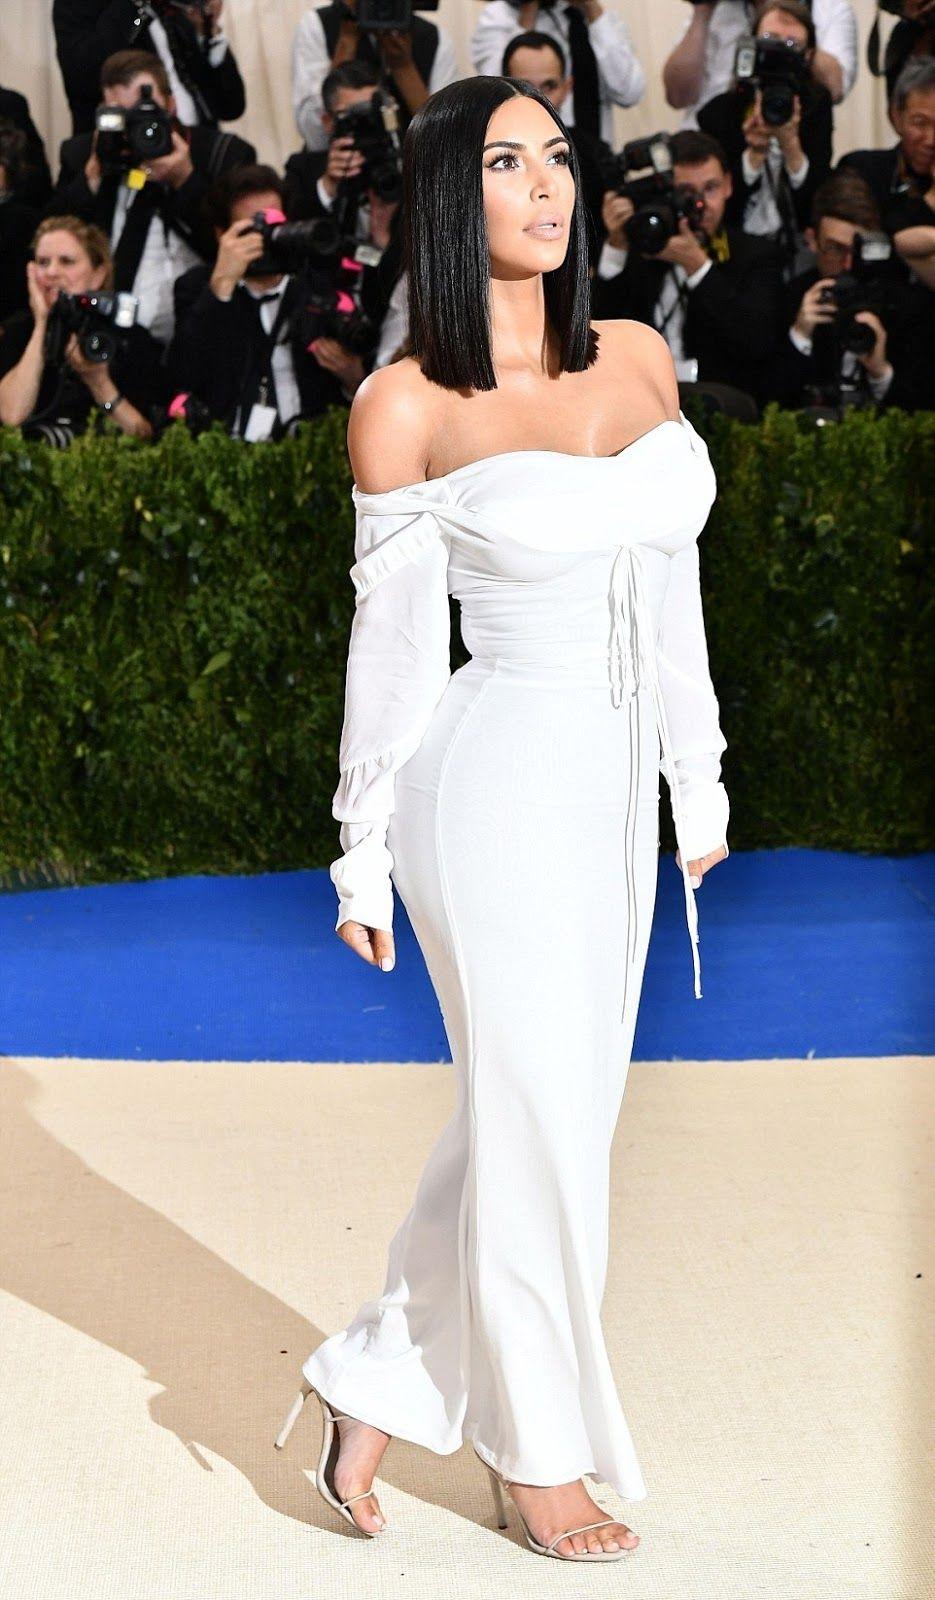 f75c3dddfdb Kim Kardashian SIMPLE For Met Gala